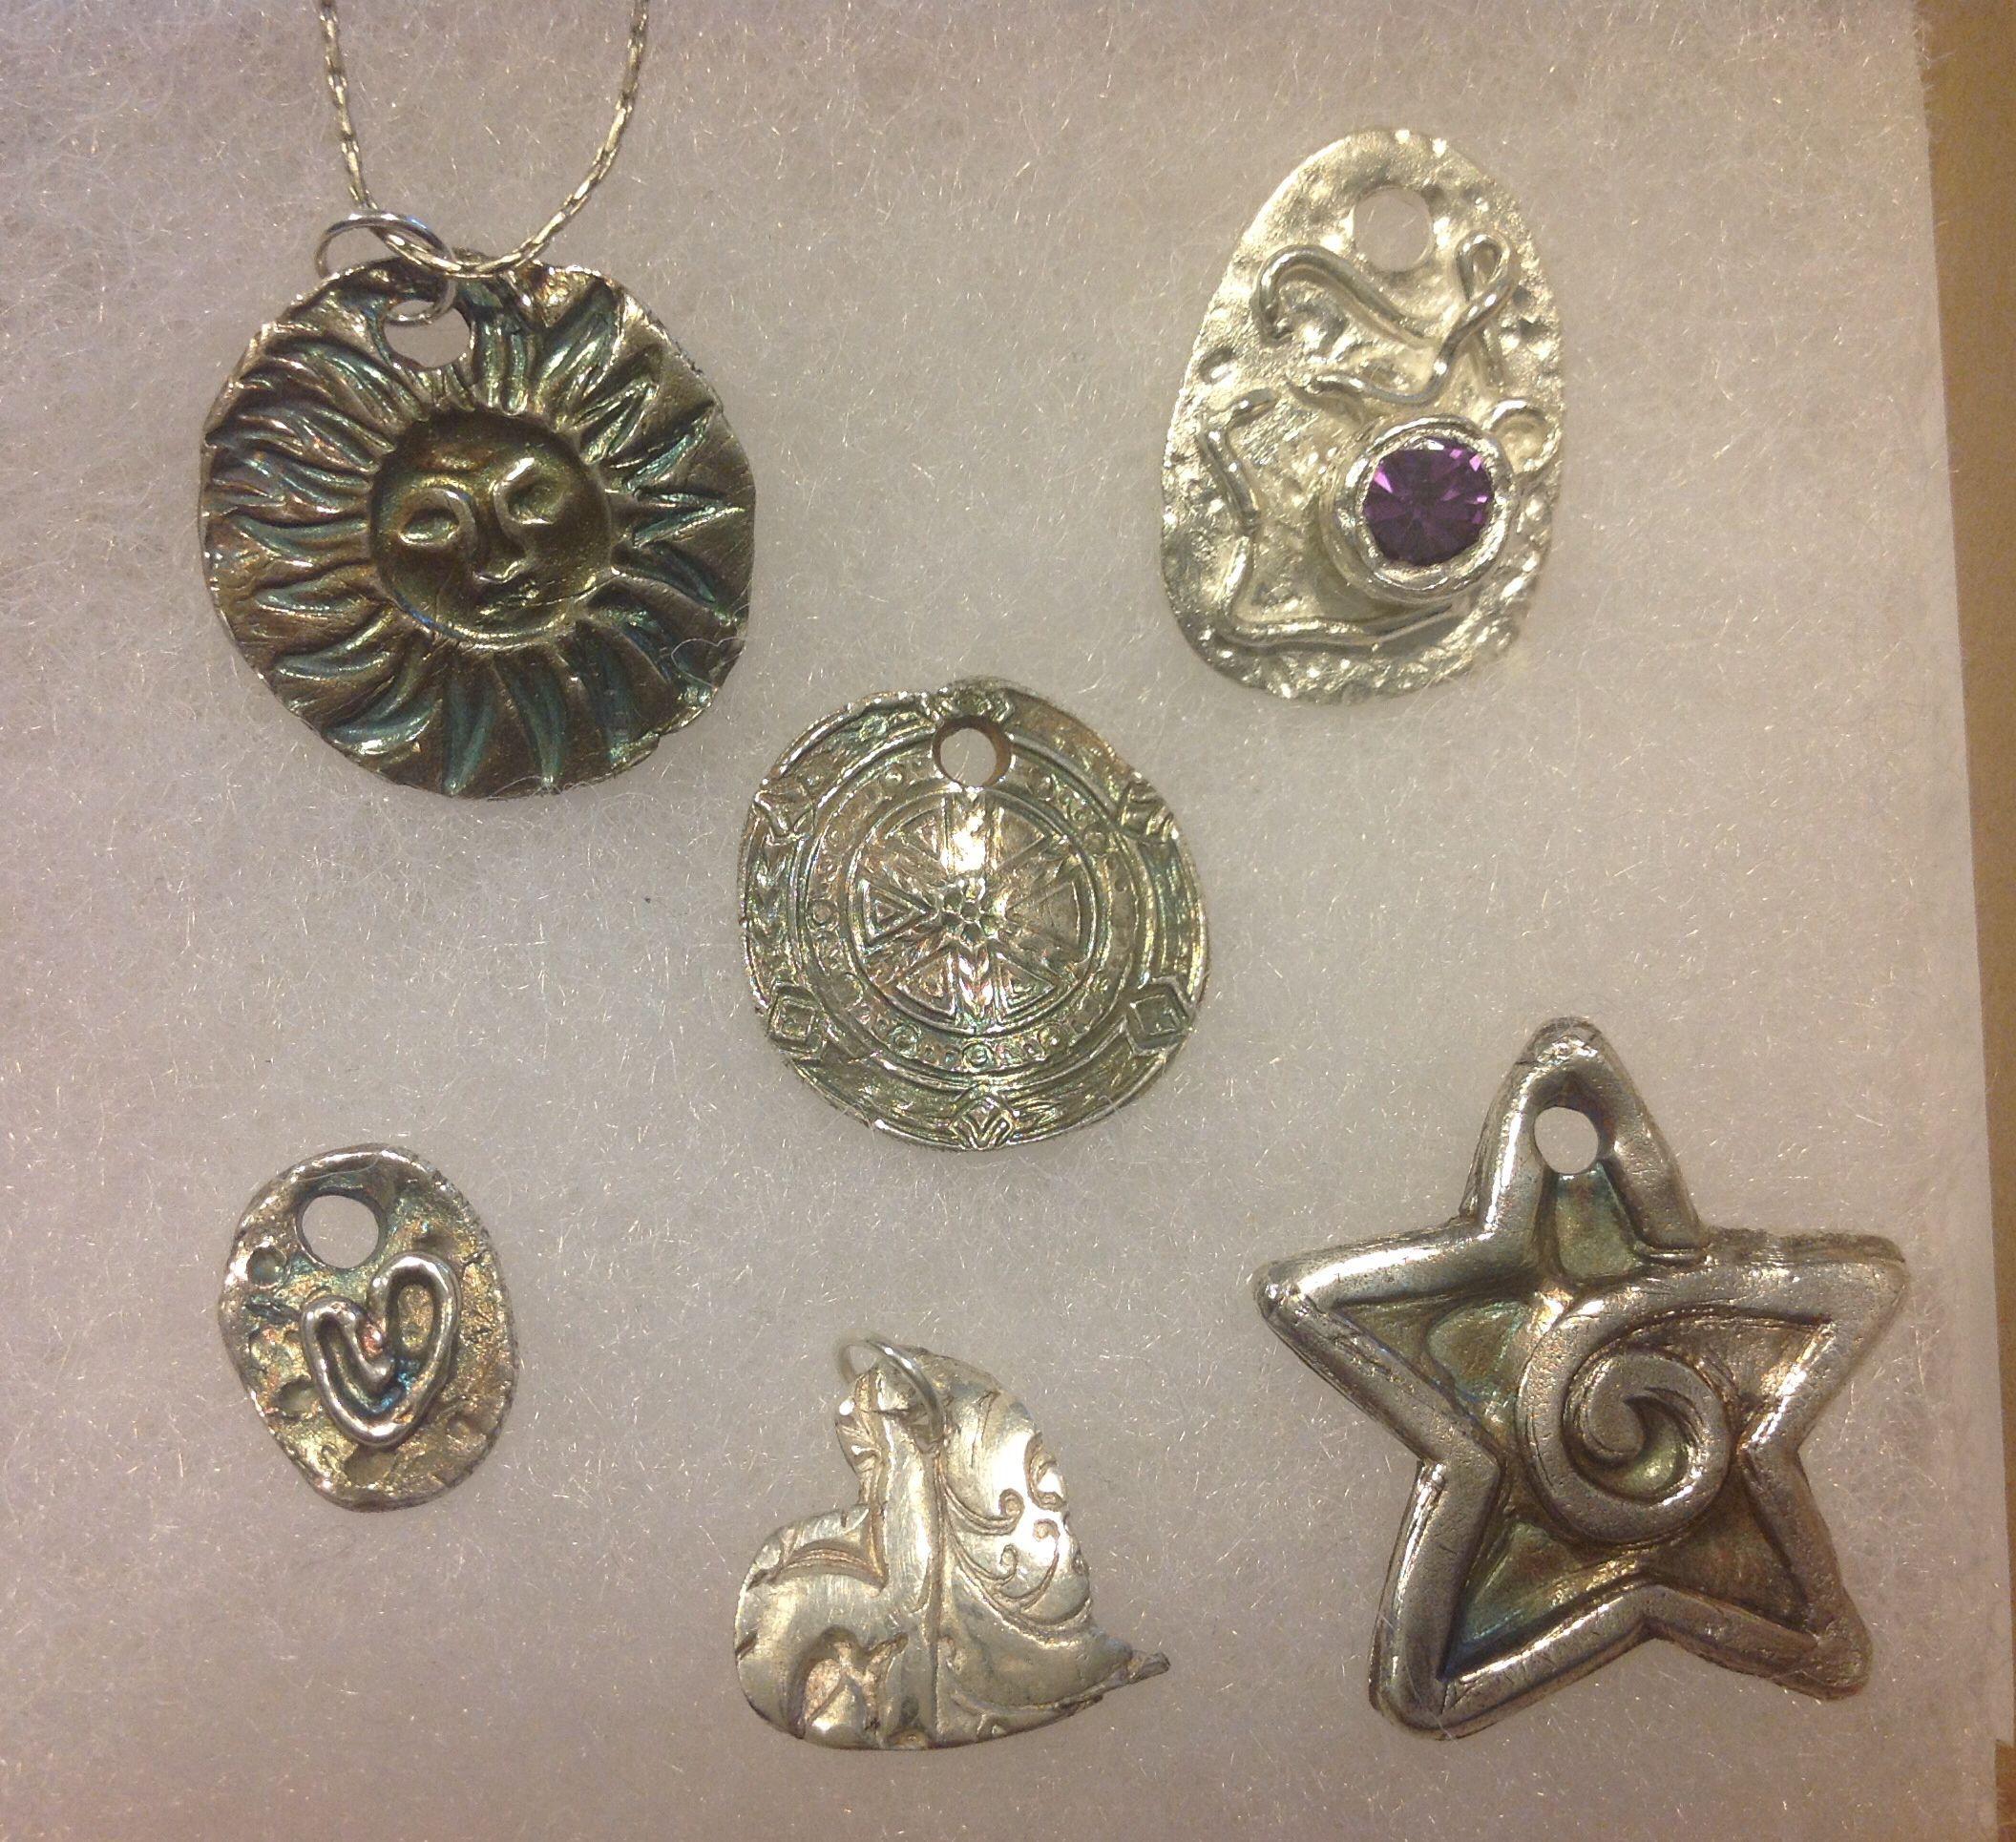 precious metal clay.  My first few pieces